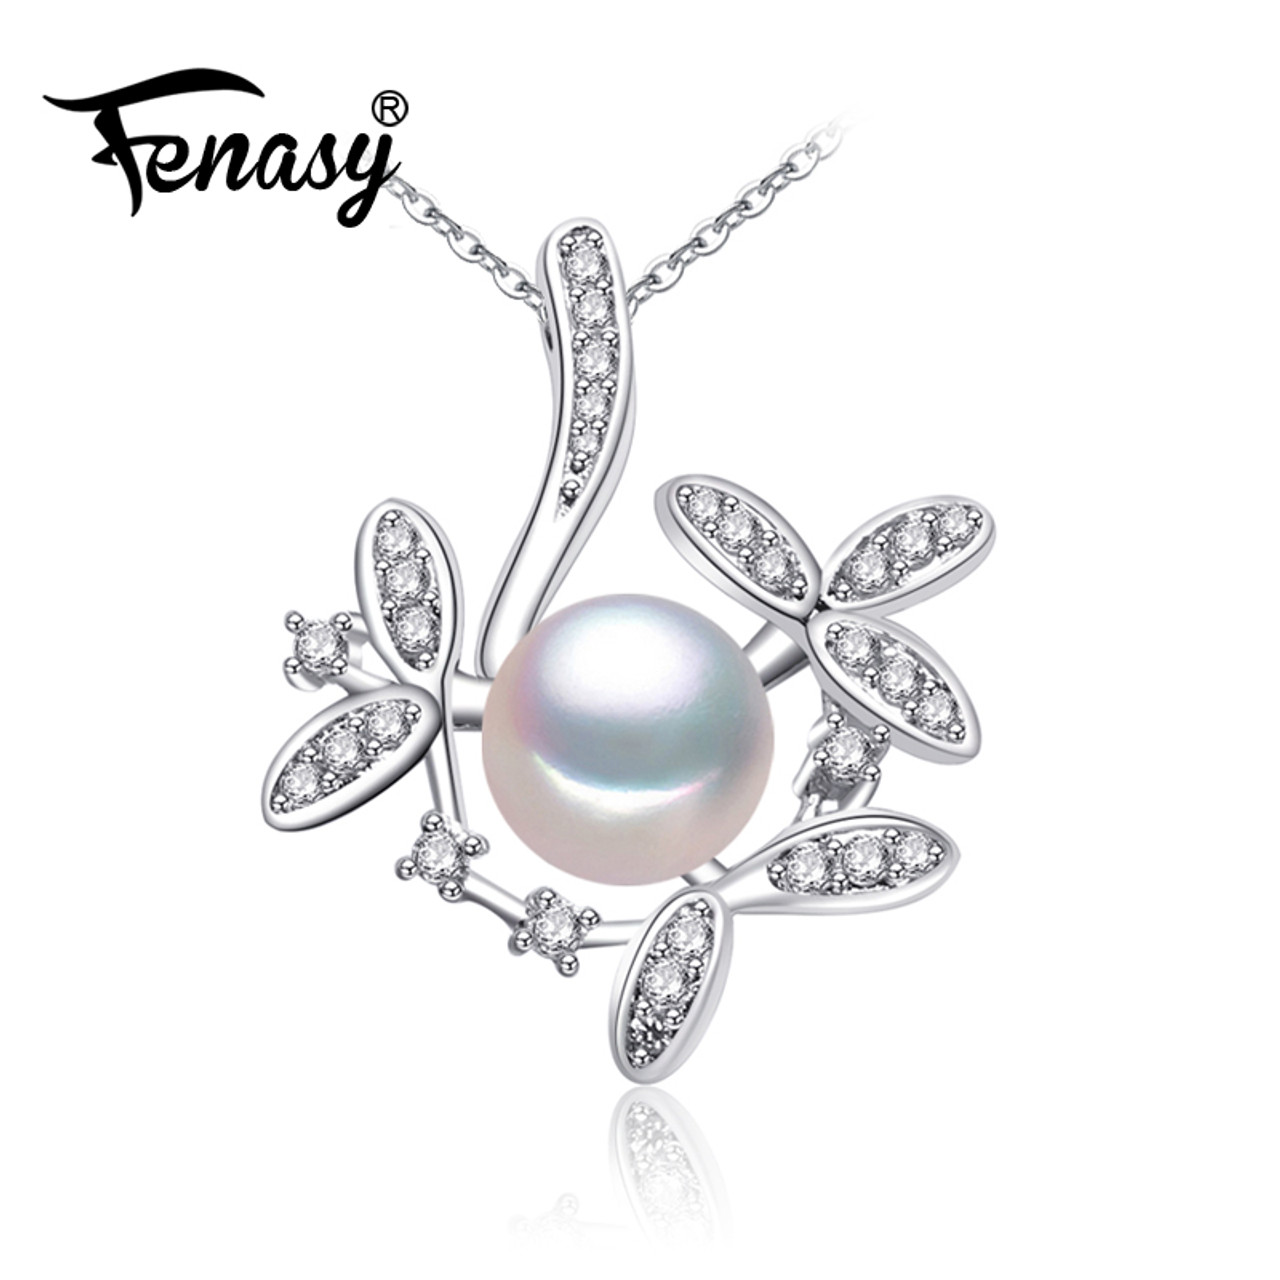 Fenasy bohemian ruby necklace pearl jewelry necklaces amp pendants fenasy bohemian ruby necklace pearl jewelry necklaces amp pendants flower jewelrynecklace women 925 aloadofball Choice Image